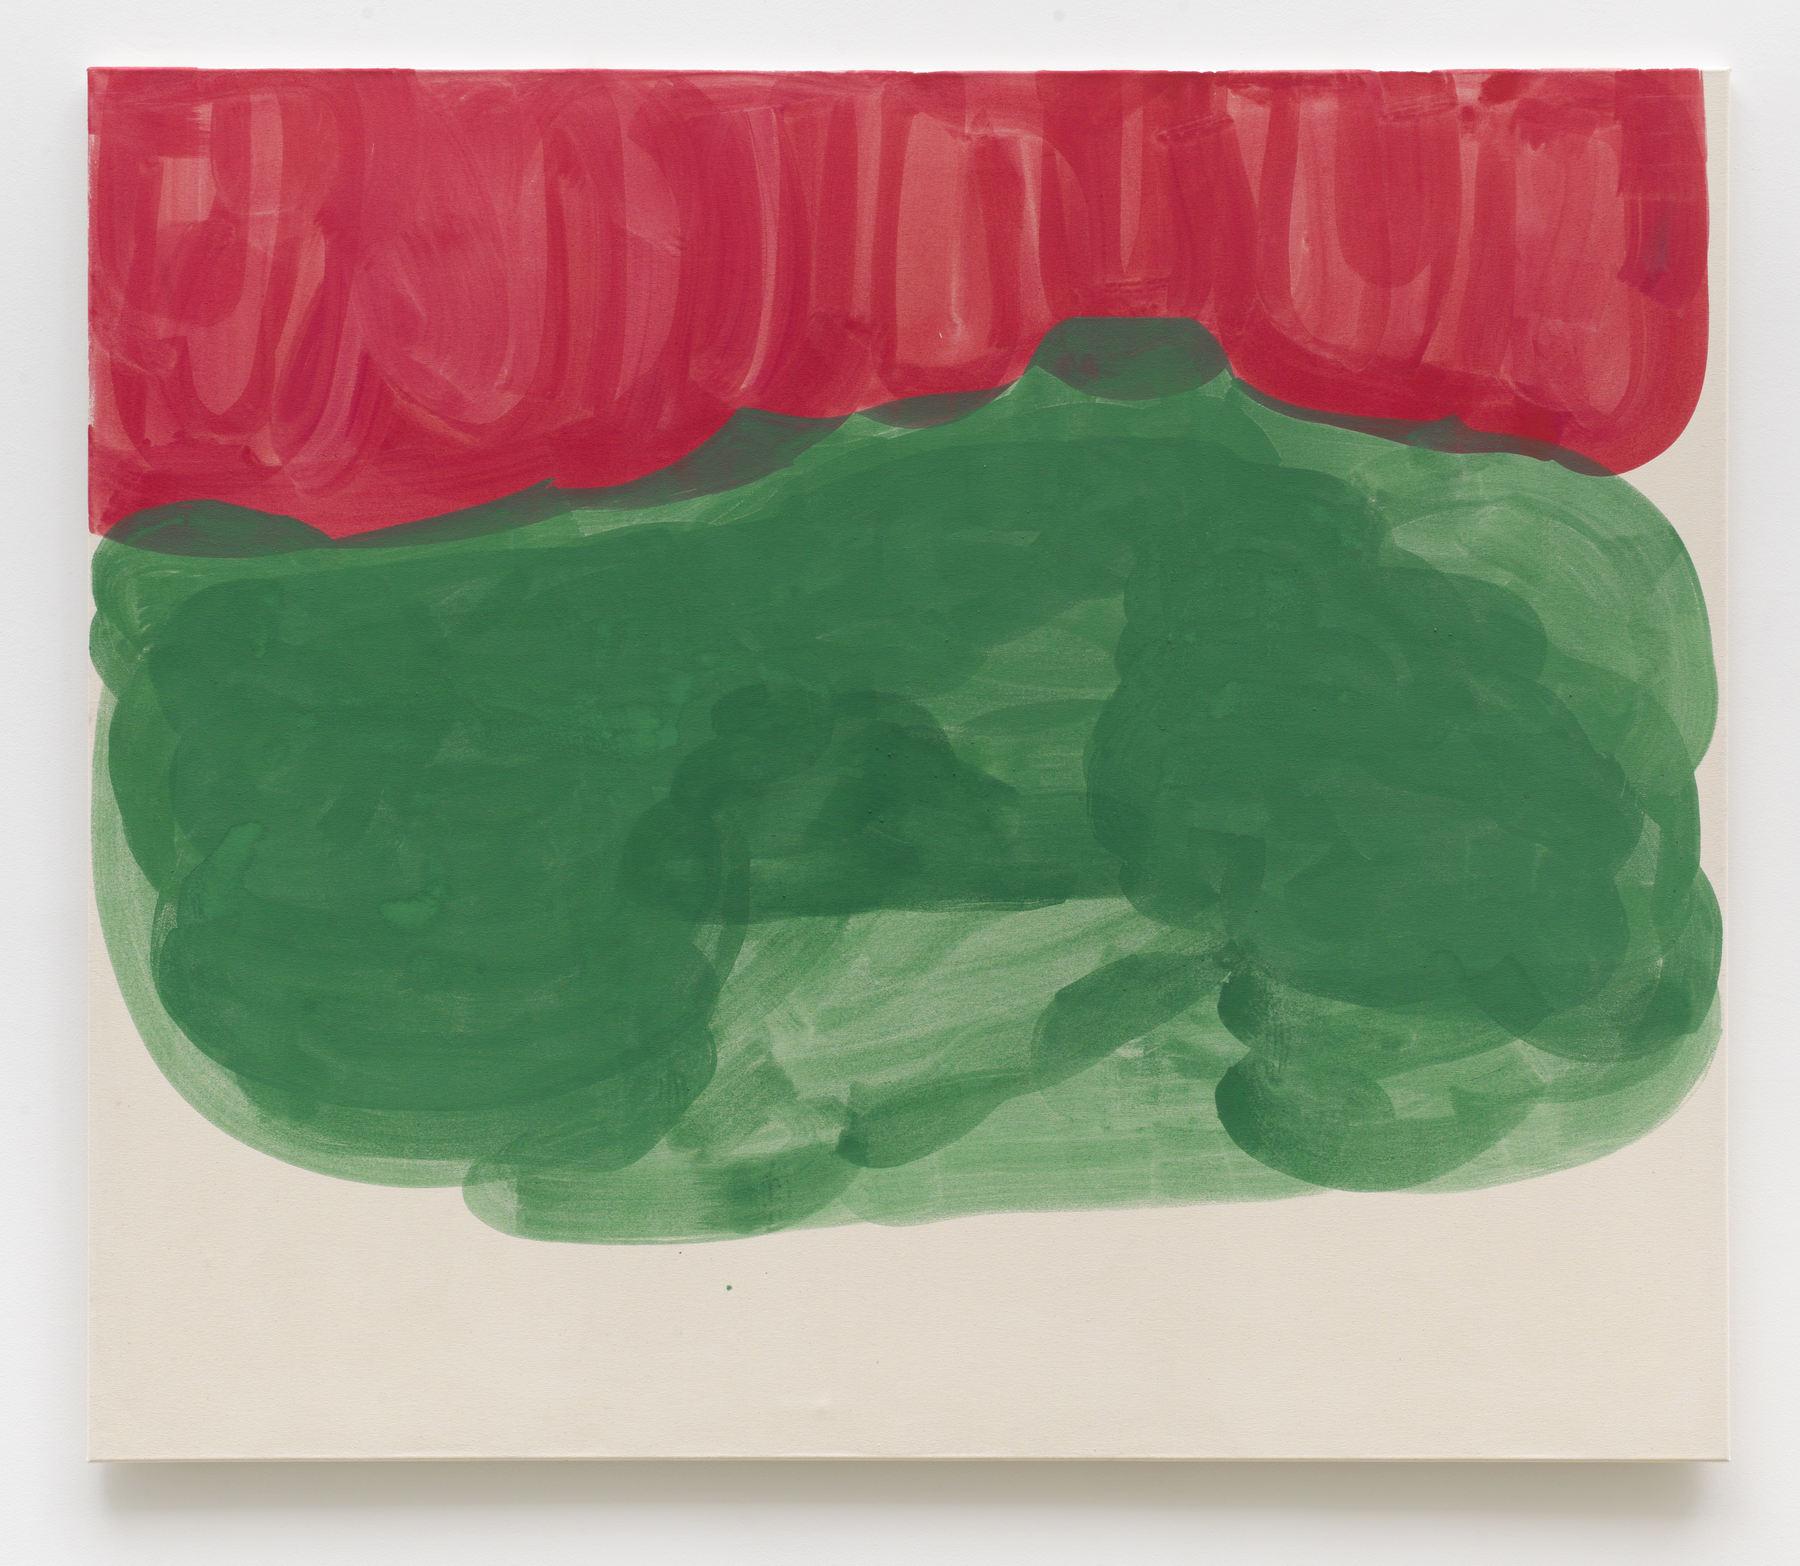 Amadyar_2017_künstler wüste_Galerie Guido W. Baudach, Berlin